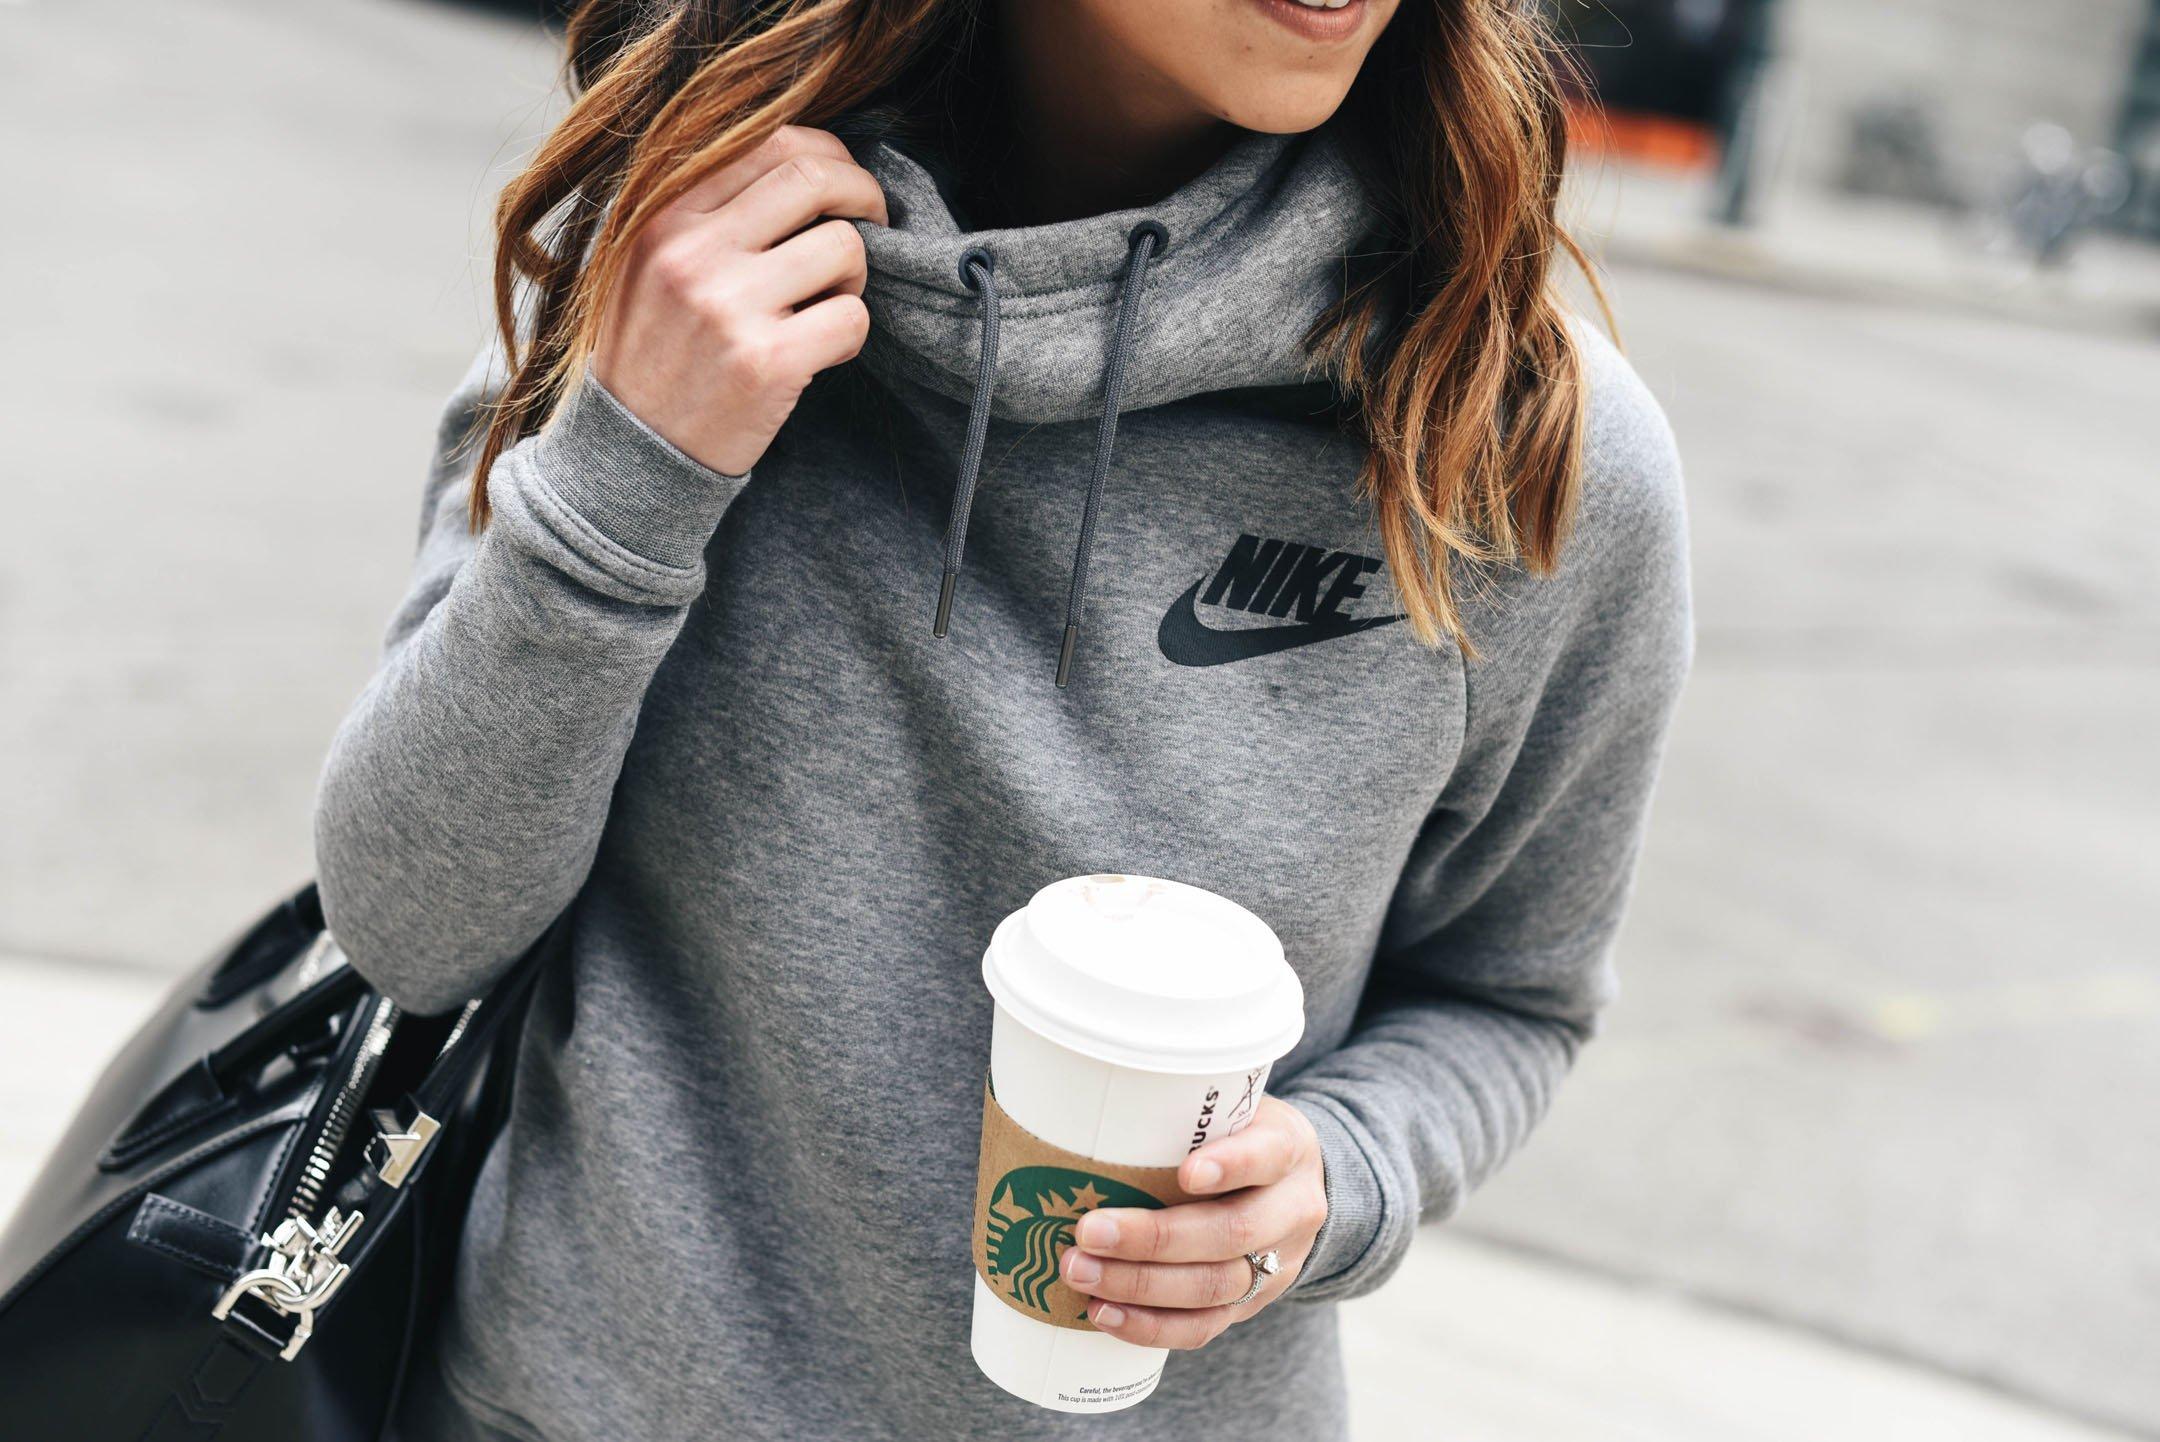 Crystalin Marie wearing Nike Funnel ralley sweatshirt